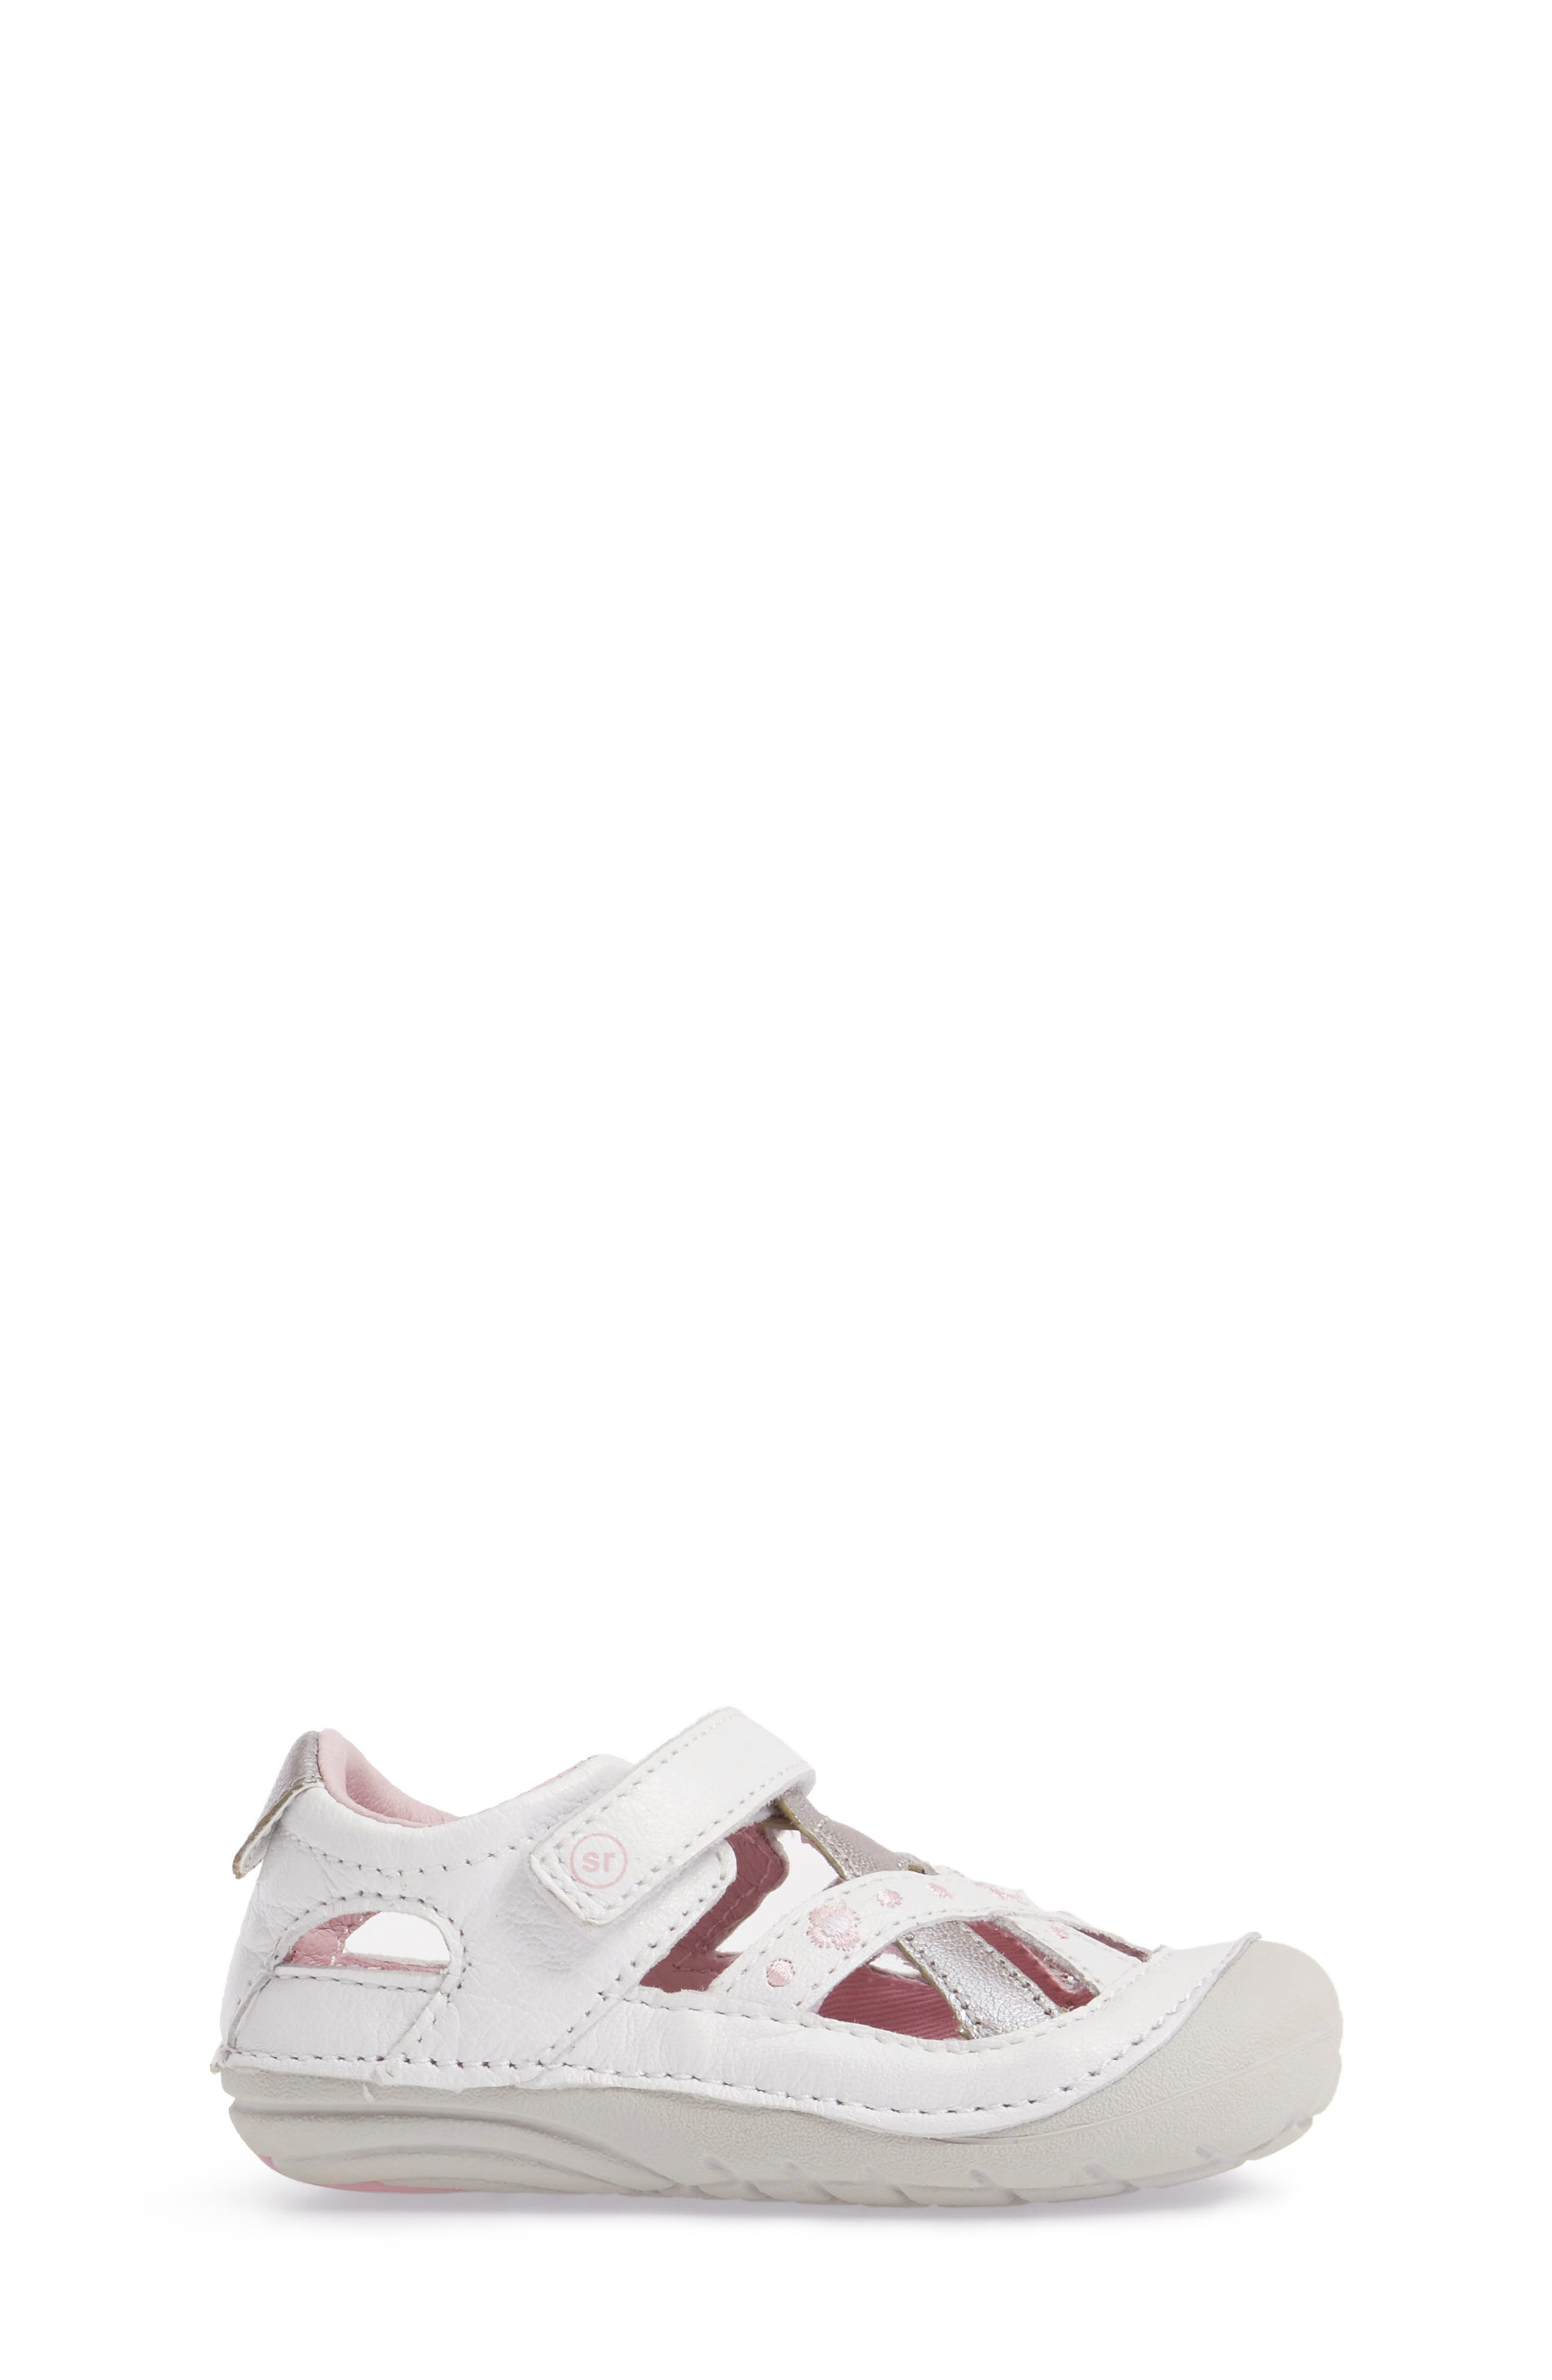 STRIDE RITE,                             Kiki Embroidered Sneaker,                             Alternate thumbnail 3, color,                             WHITE